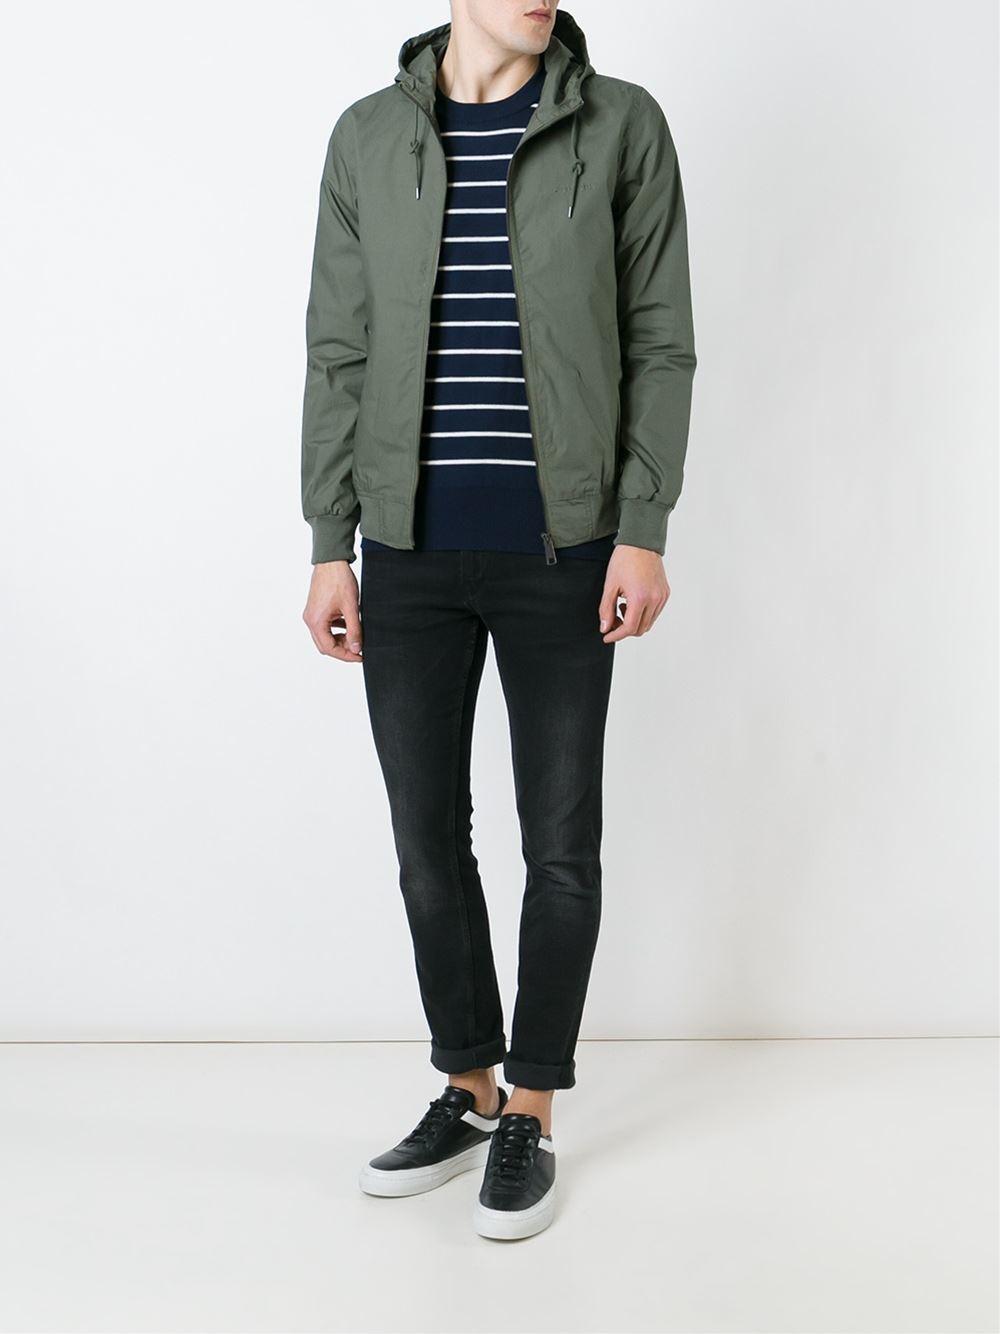 Carhartt Cotton 'marsh' Jacket in Green for Men